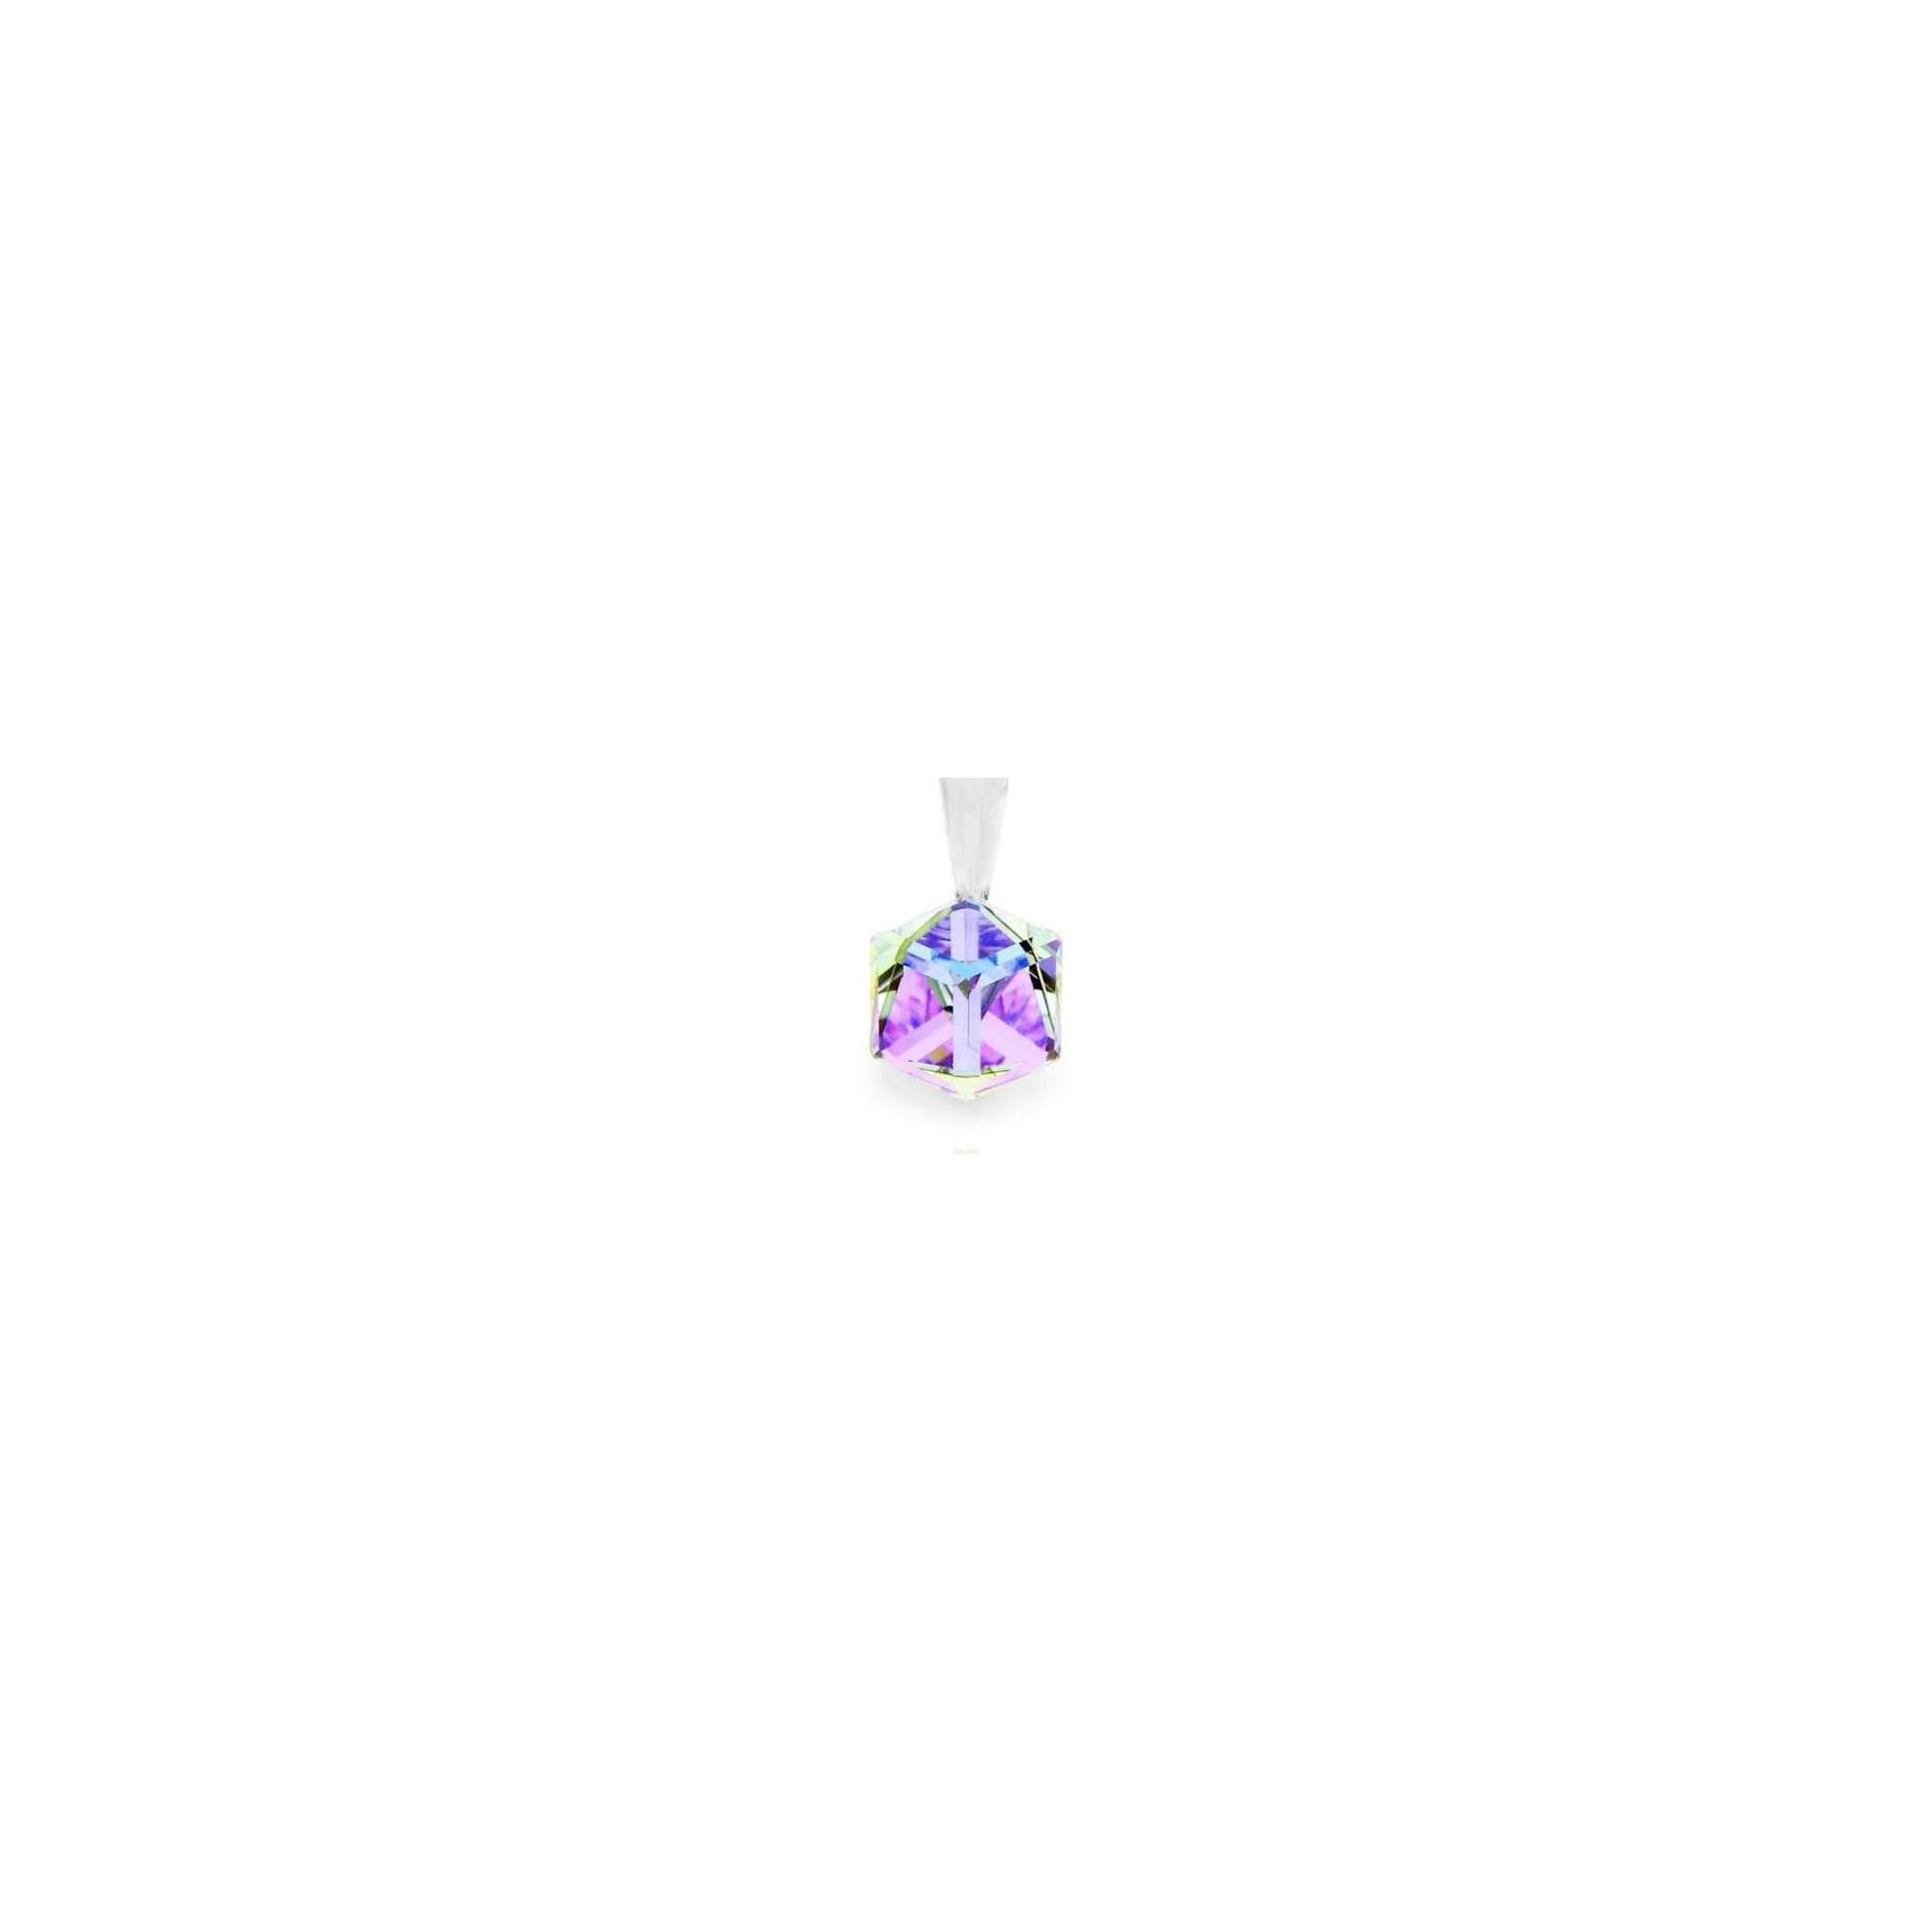 KOCKA ALAKÚ MEDÁL - crystal ab